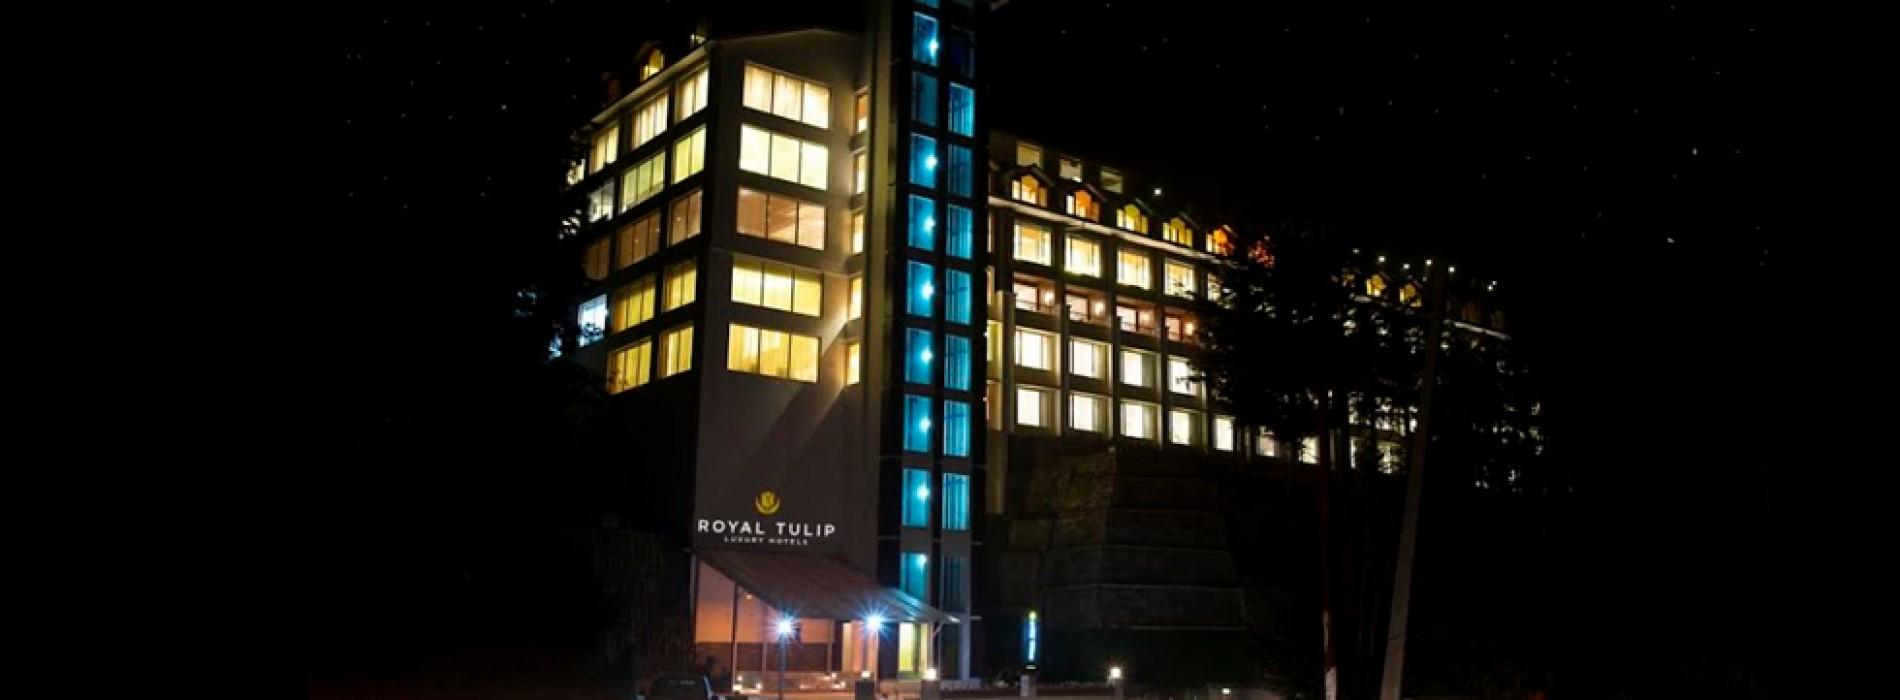 Kufri gets its first International five star hotel with the launch of Royal Tulip Kufri, Shimla